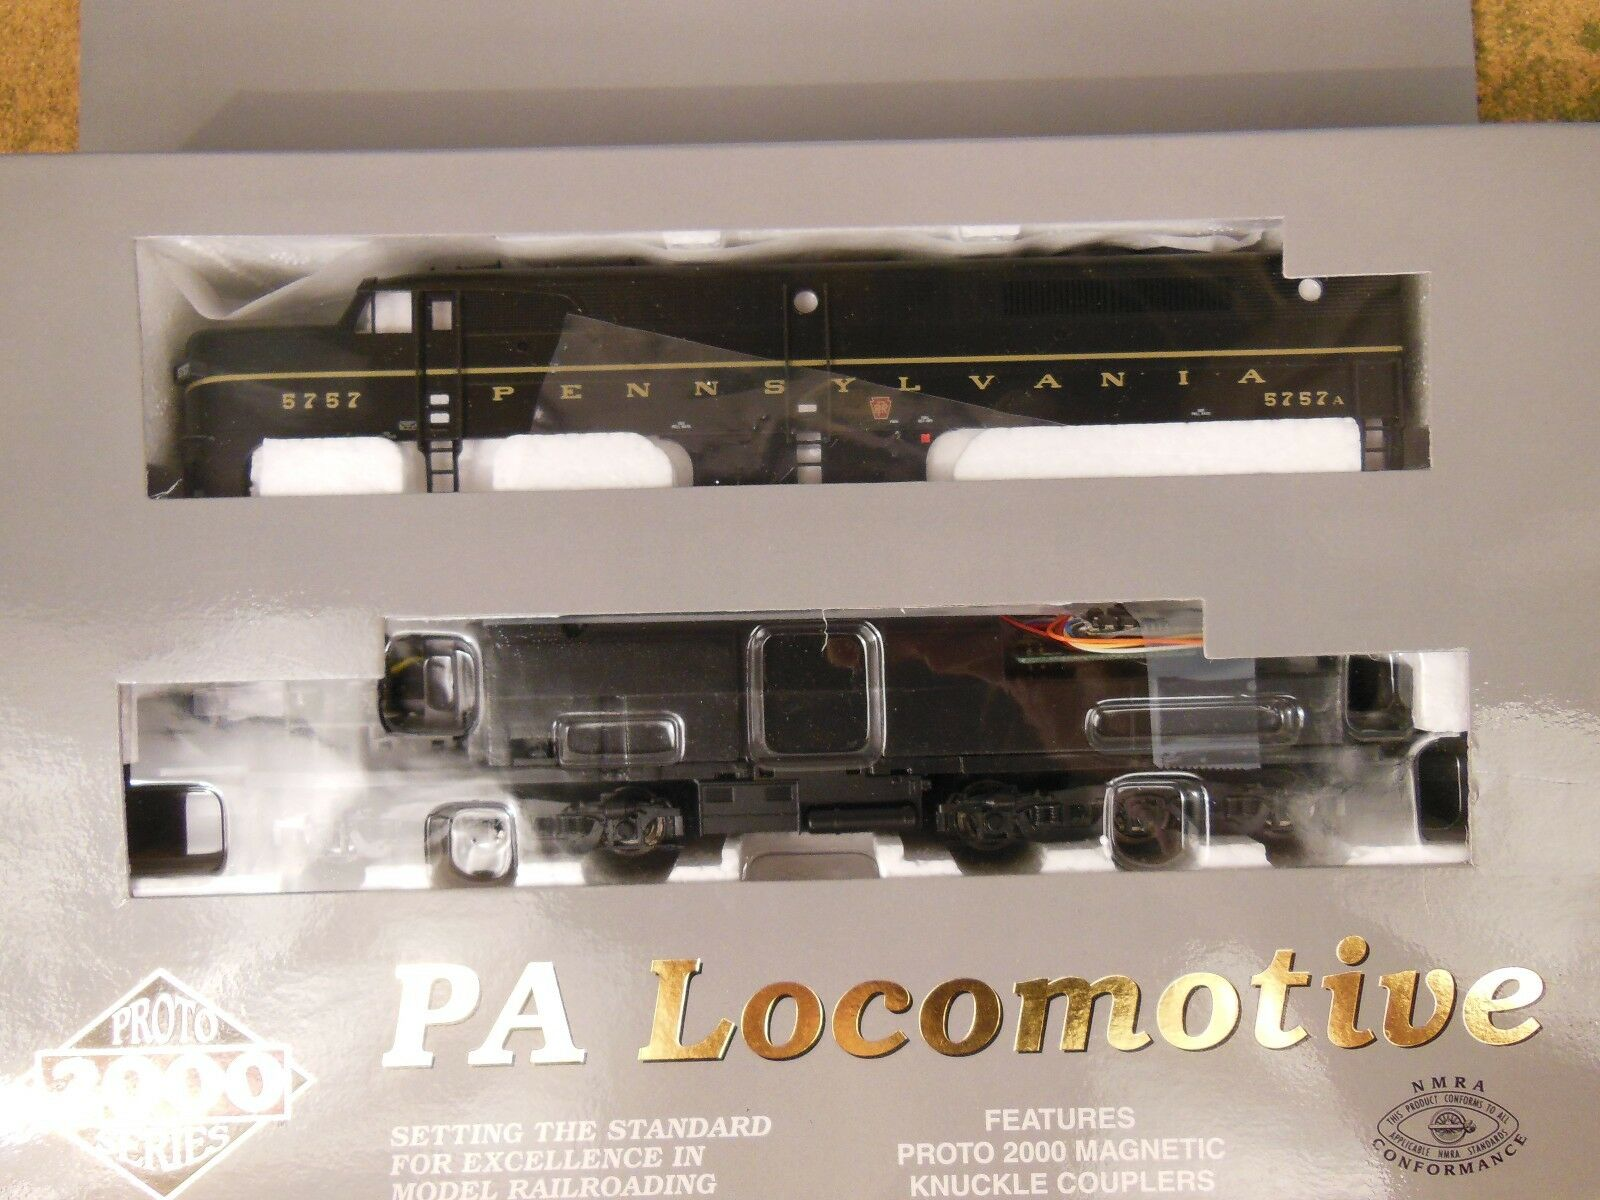 Ho Projoo 2000 Pennsylvania PA   5757a Locomotora Dcc Equipado